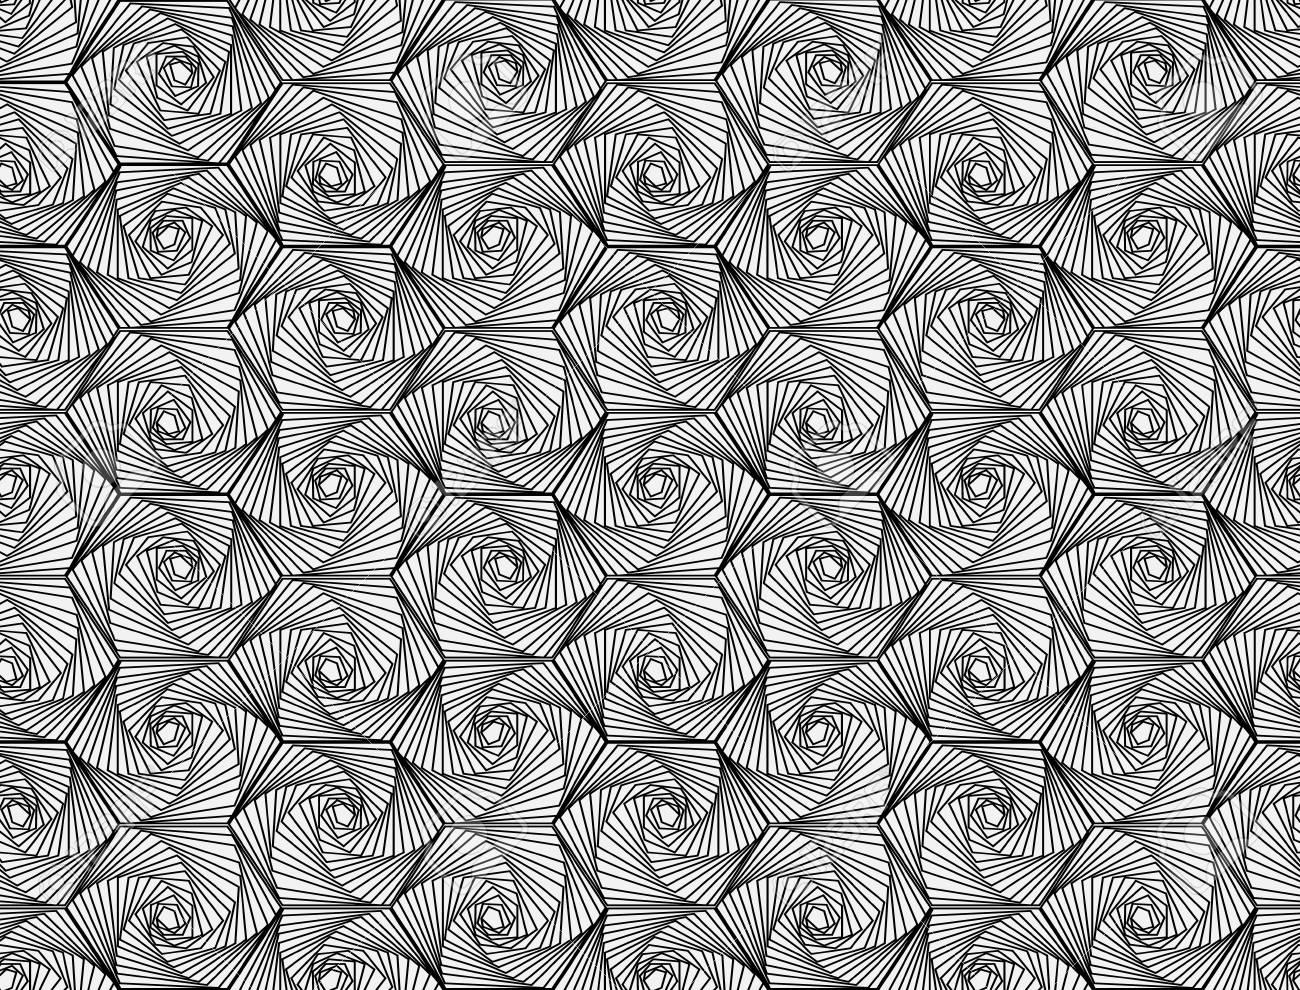 Zentangle Pattern Black And White Ornamental Seamless Vector